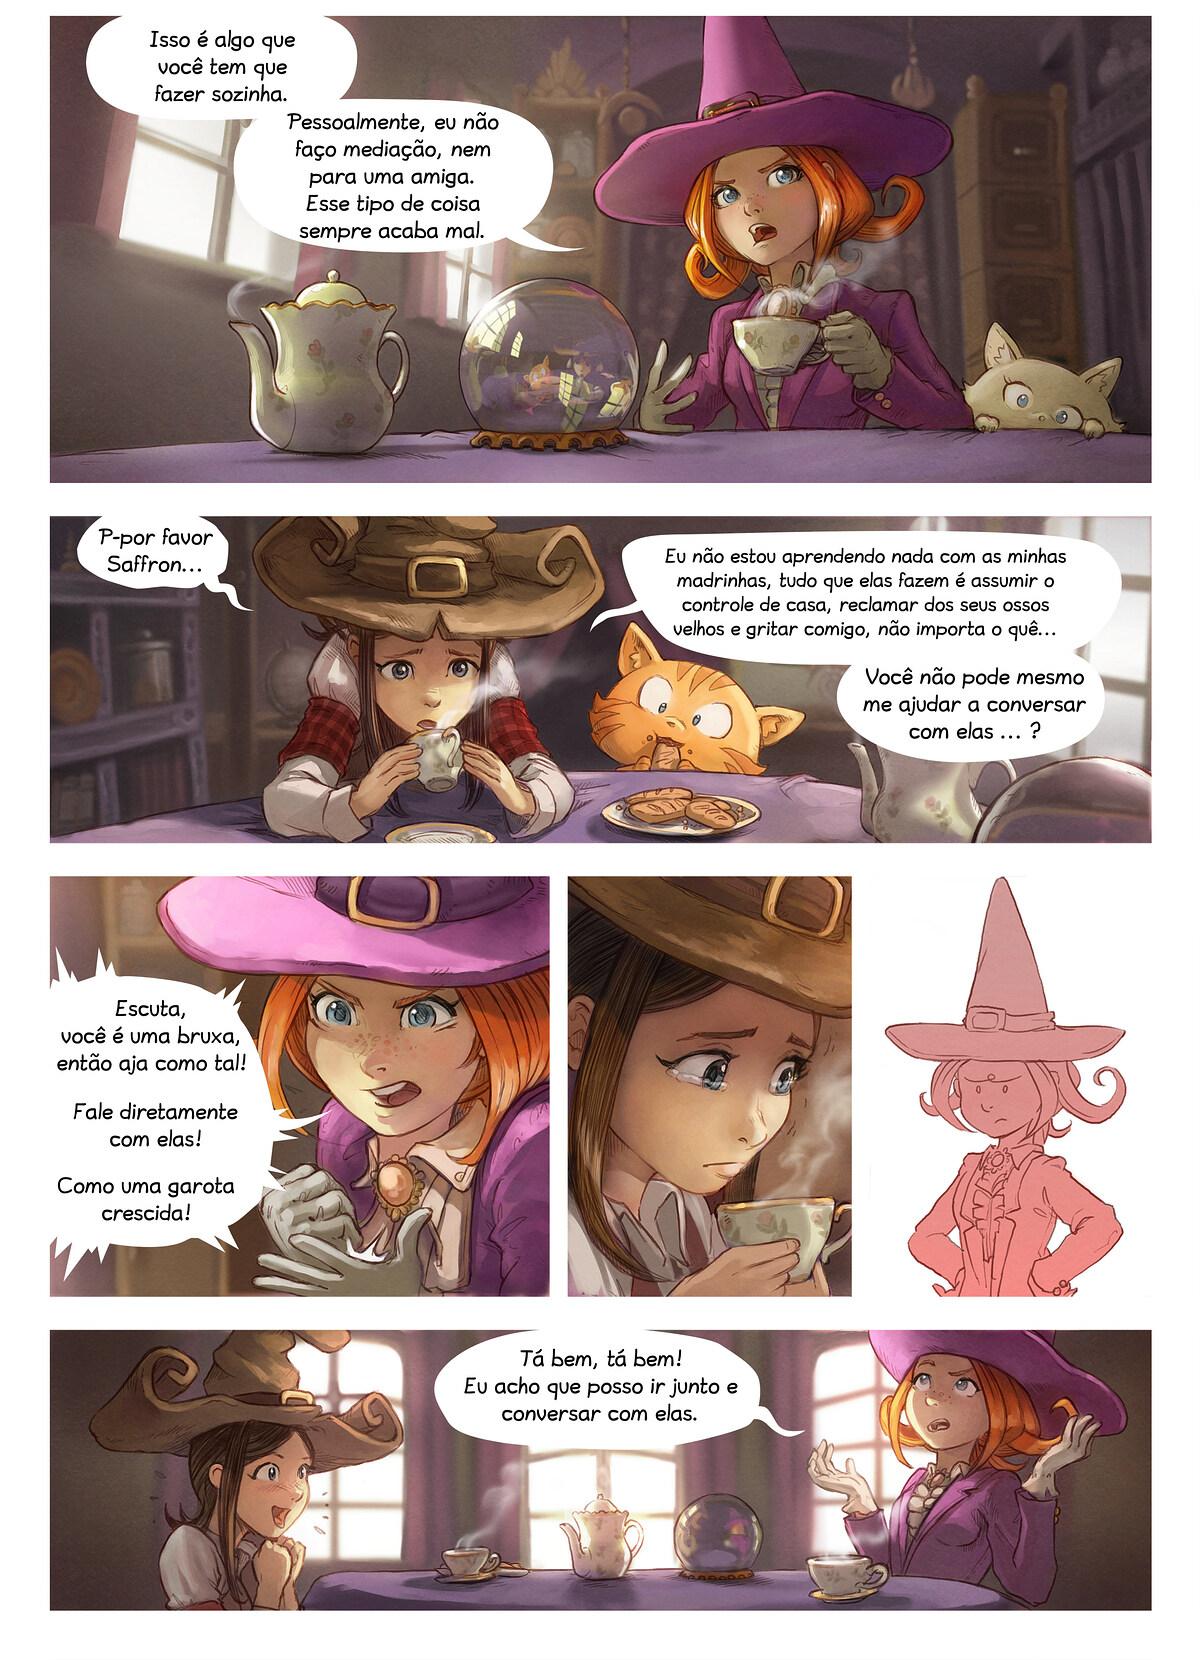 A webcomic page of Pepper&Carrot, episódio 16 [pt], página 2